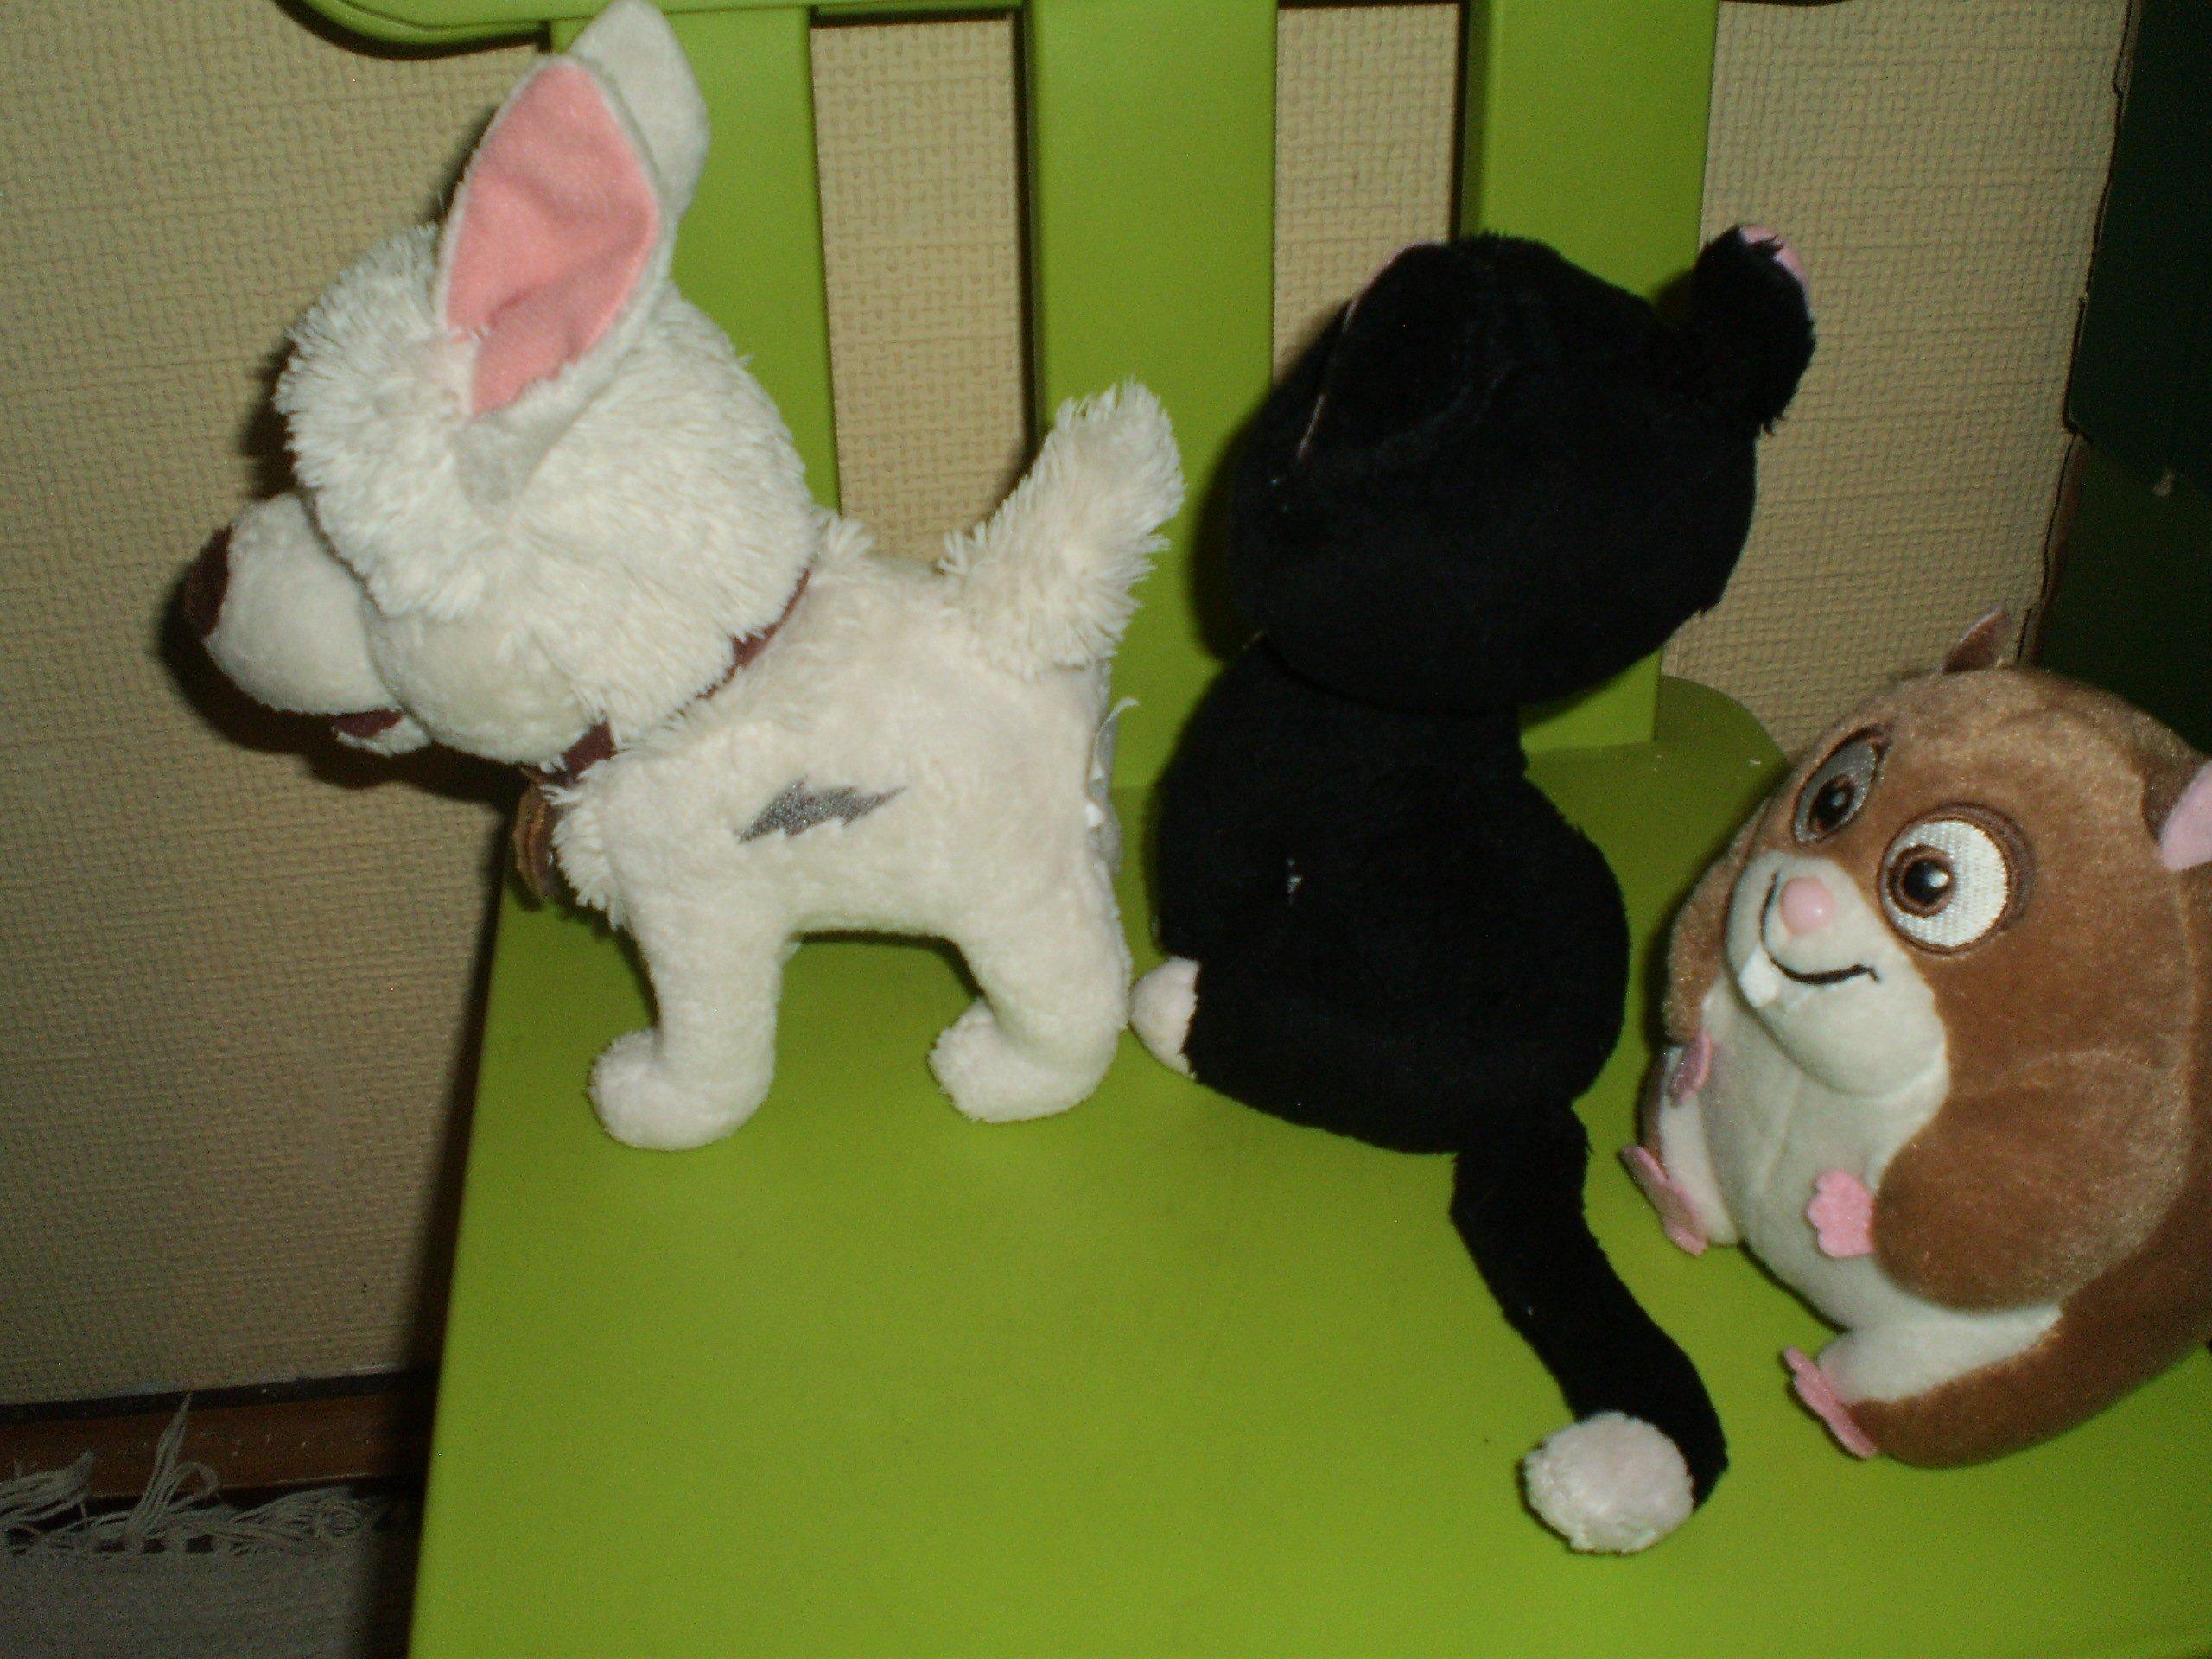 Pies Piorun Kot Marlenka I Adylla Disney 7138344633 Oficjalne